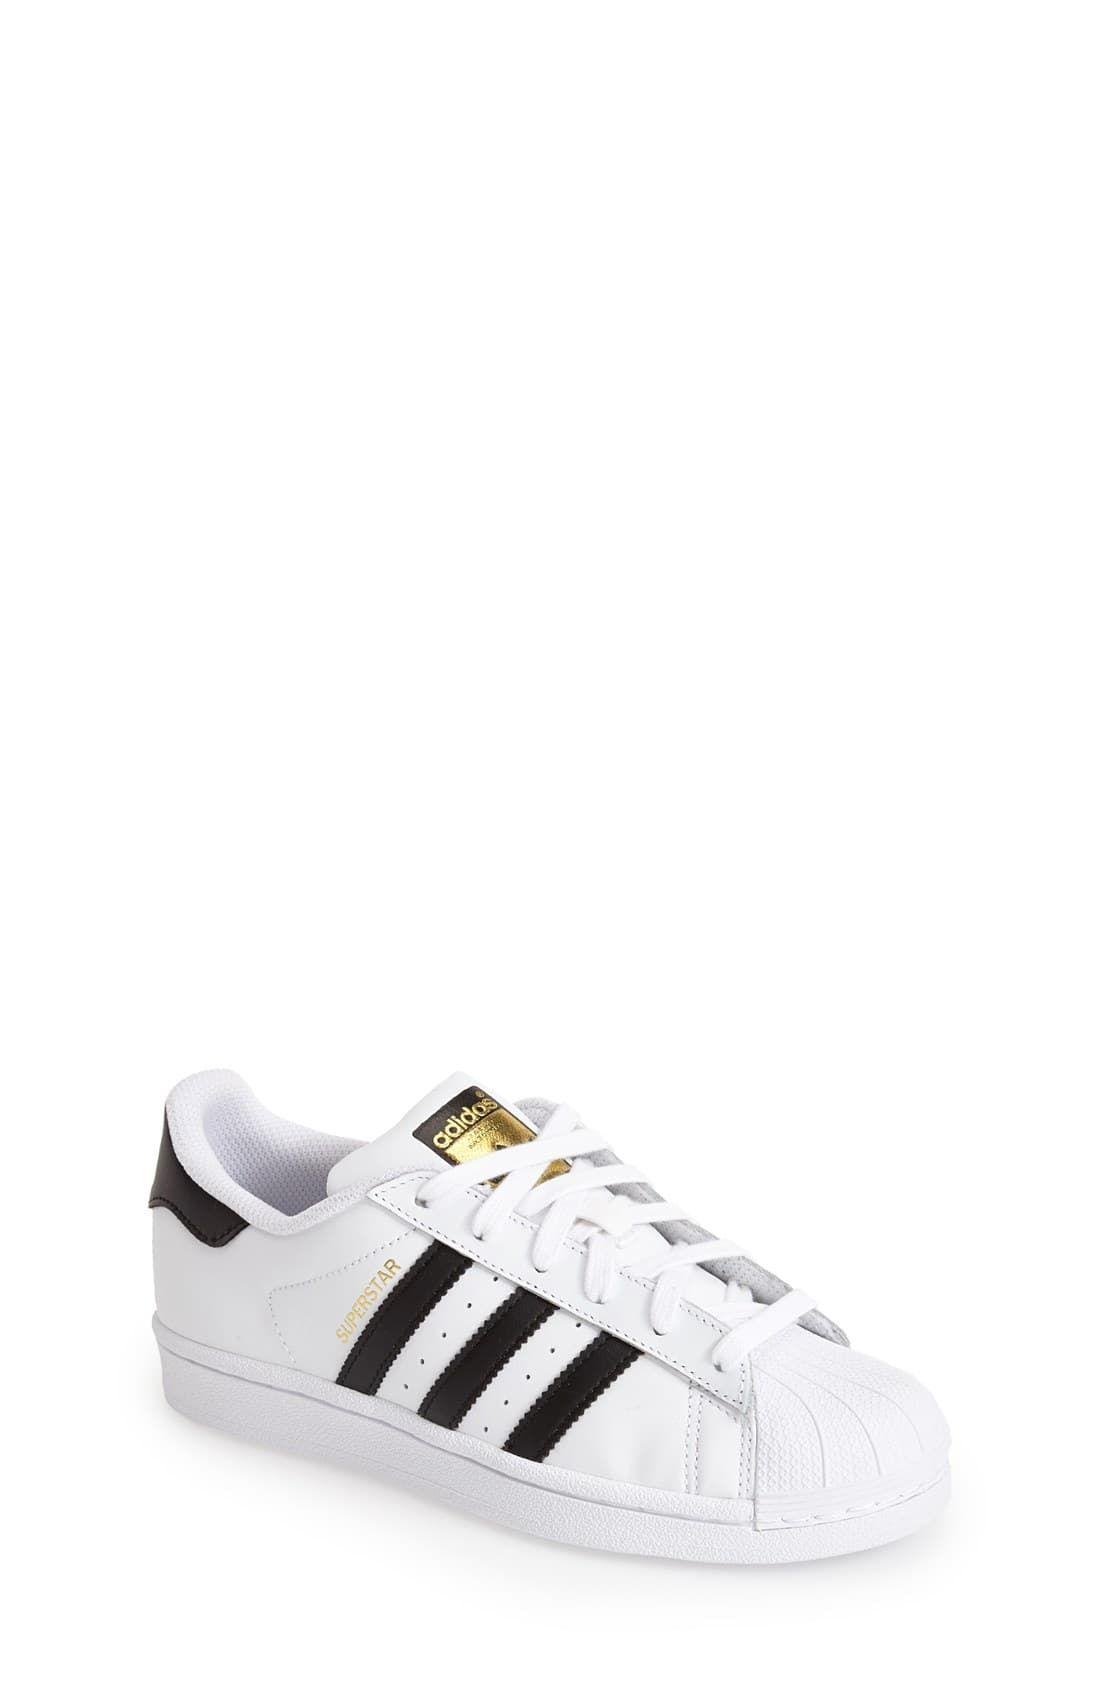 adidas superstar ii white black size 6